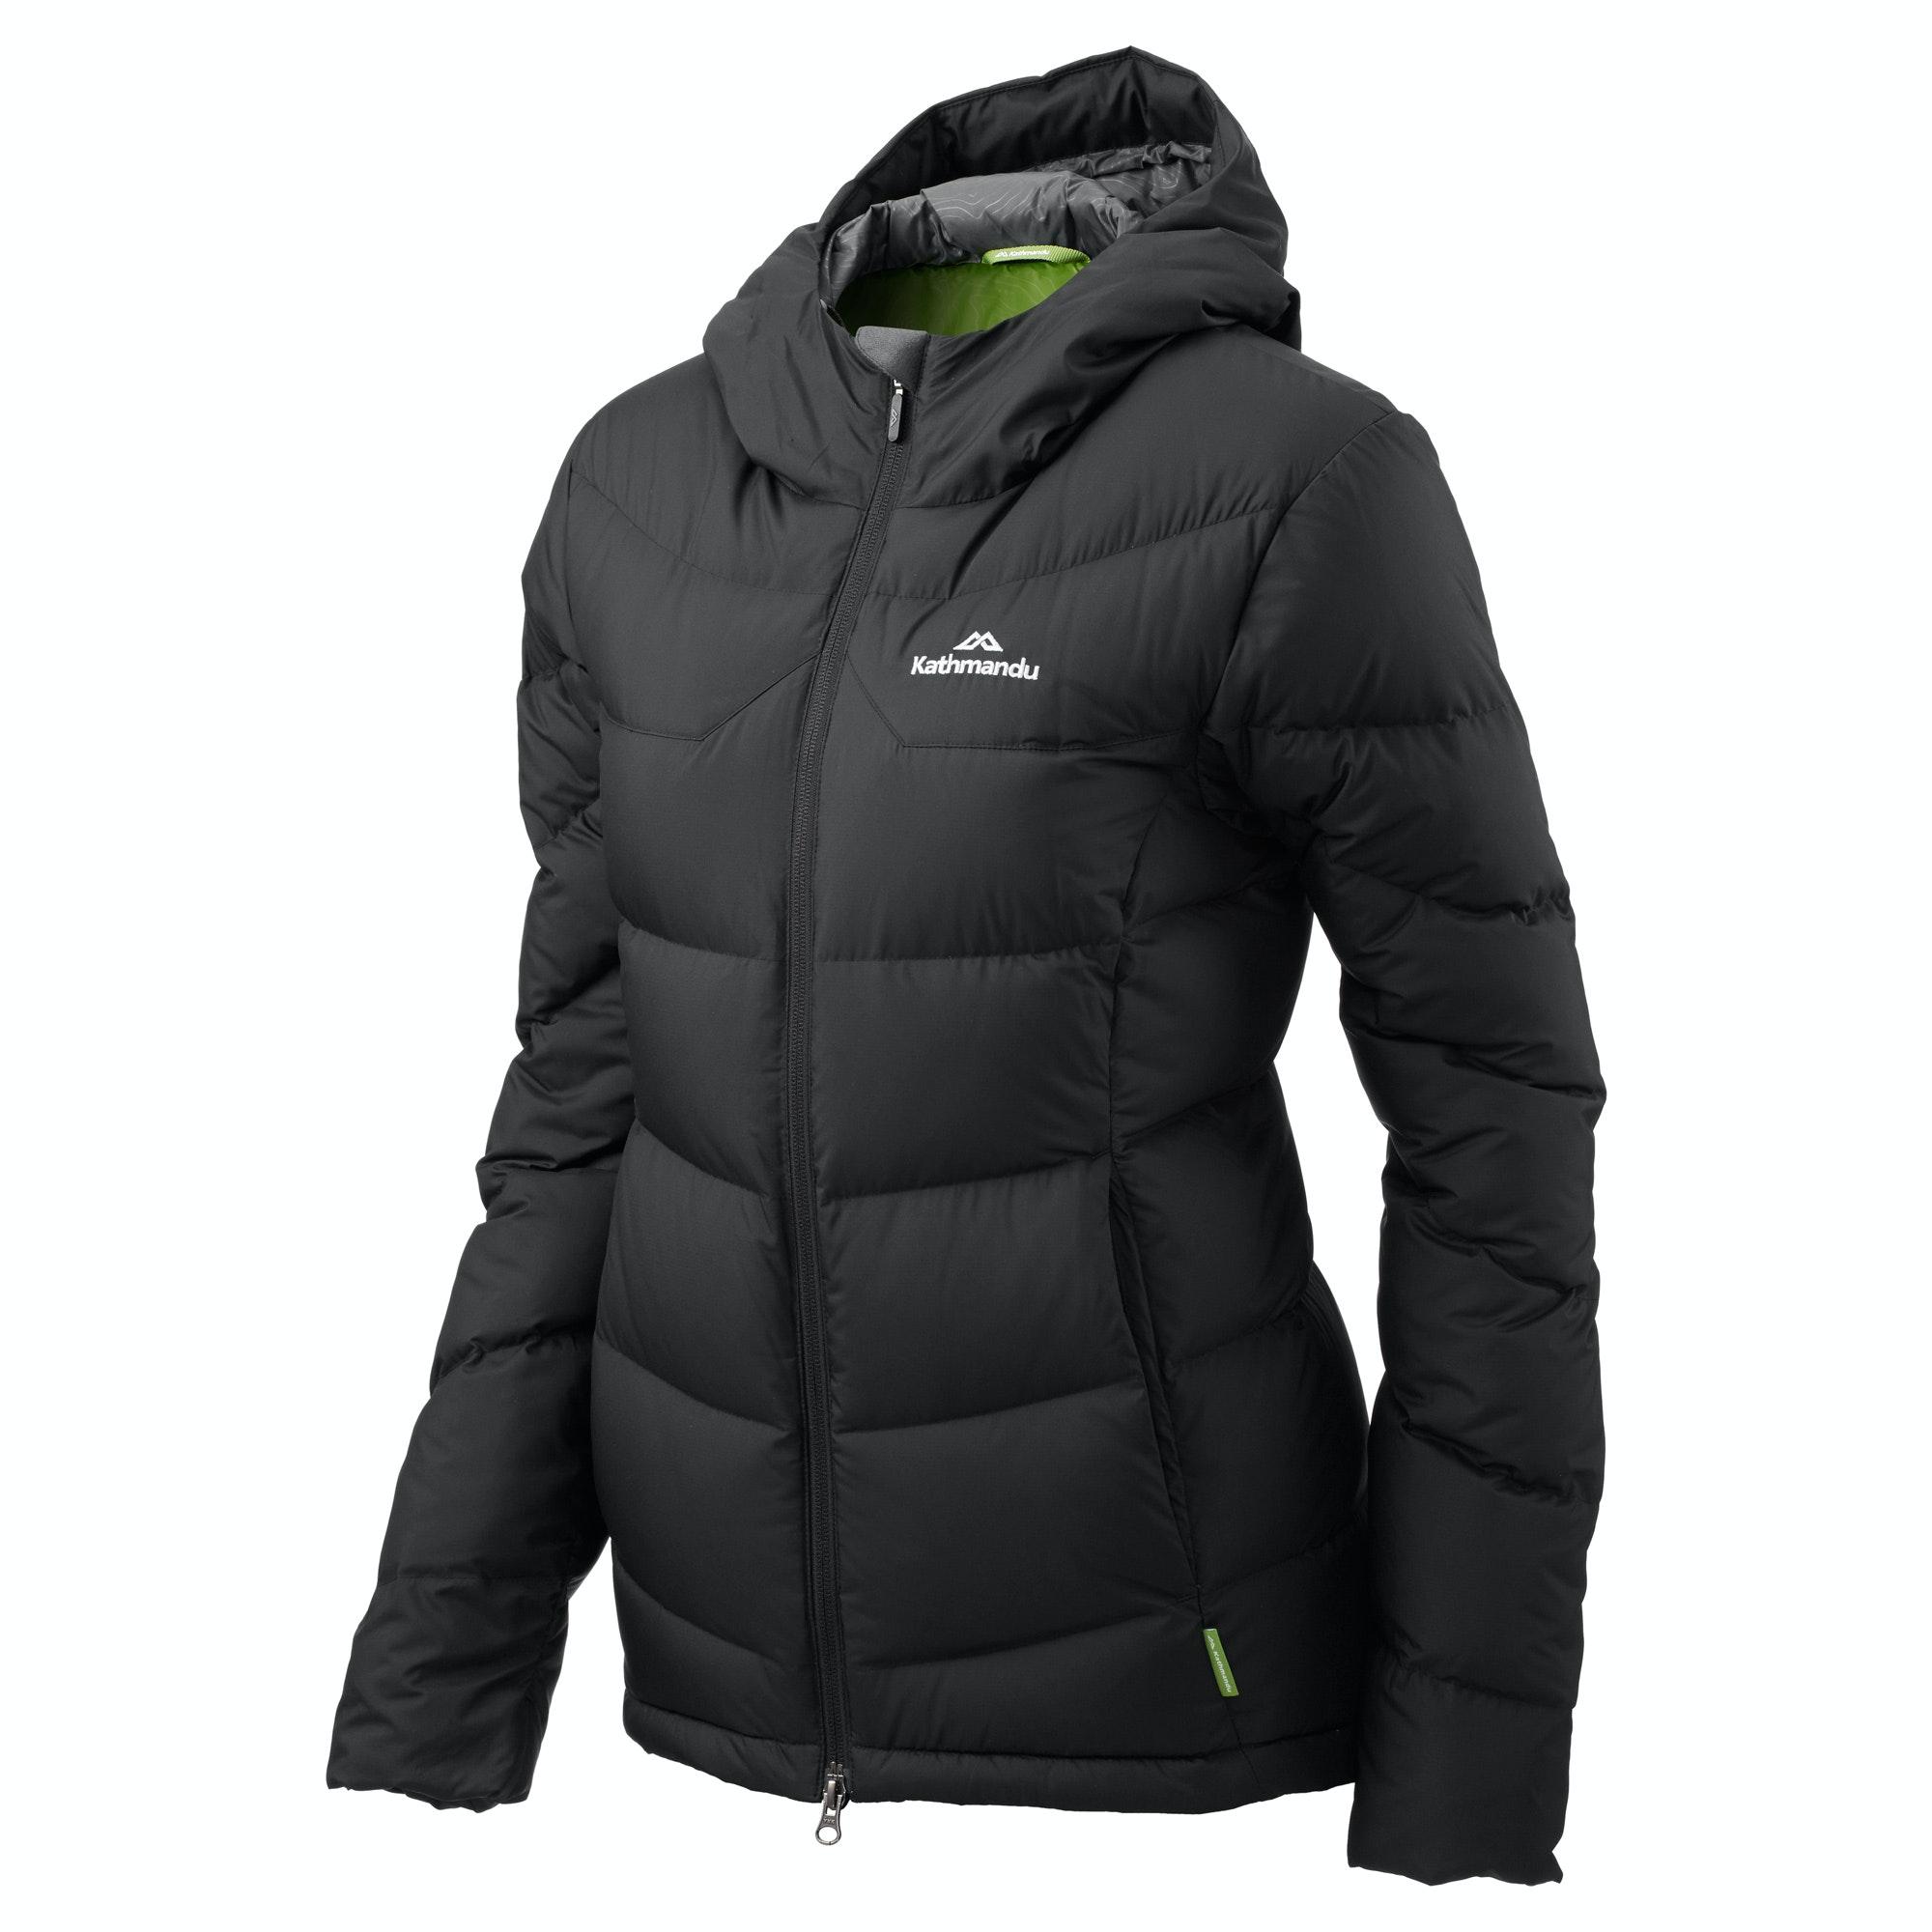 NEW-Kathmandu-Epiq-Women-039-s-Hooded-Warm-Winter-Duck-Down-Puffer-Jacket